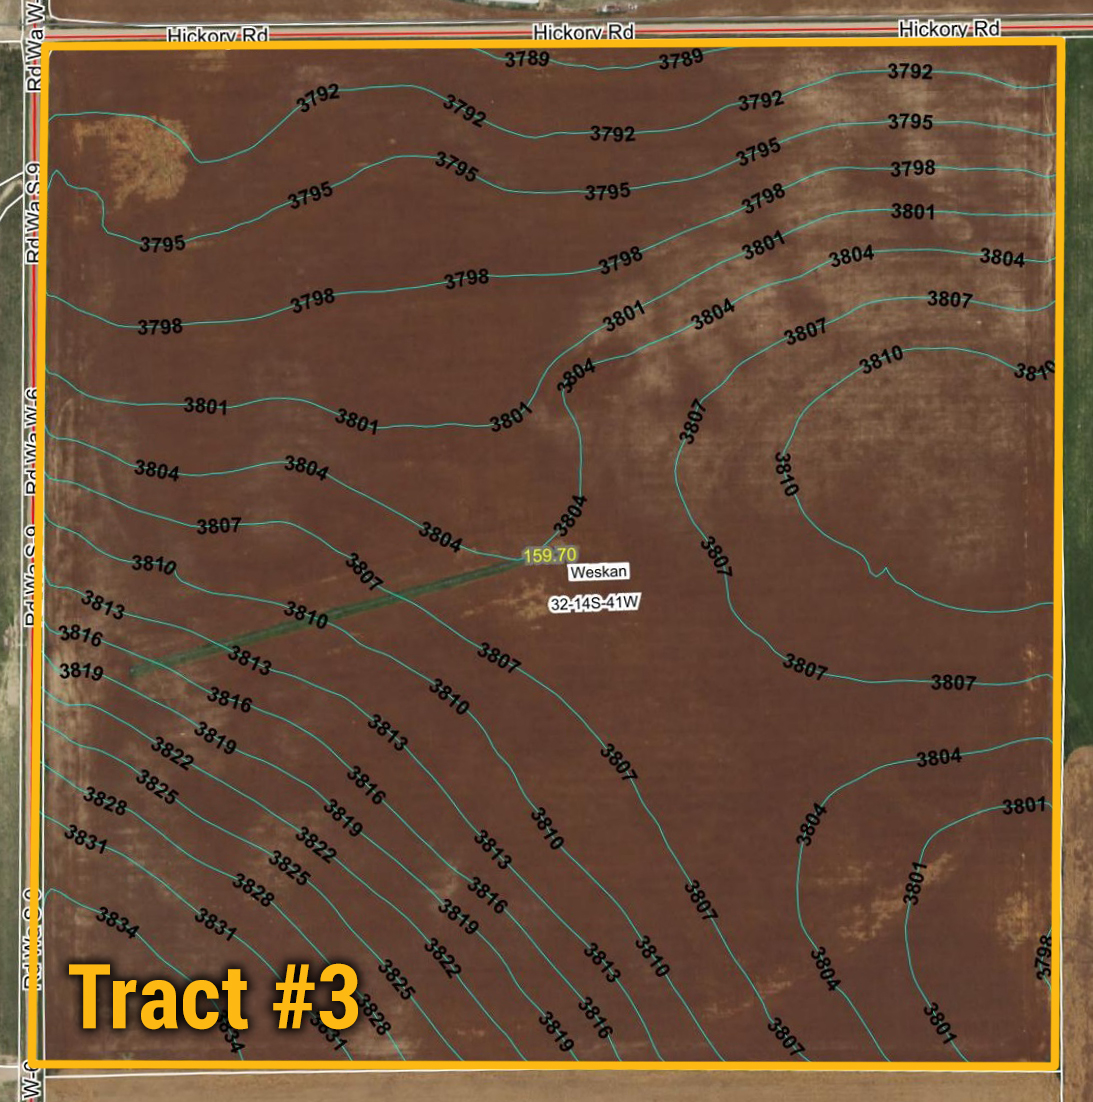 Topography Contours-3-BIR2124